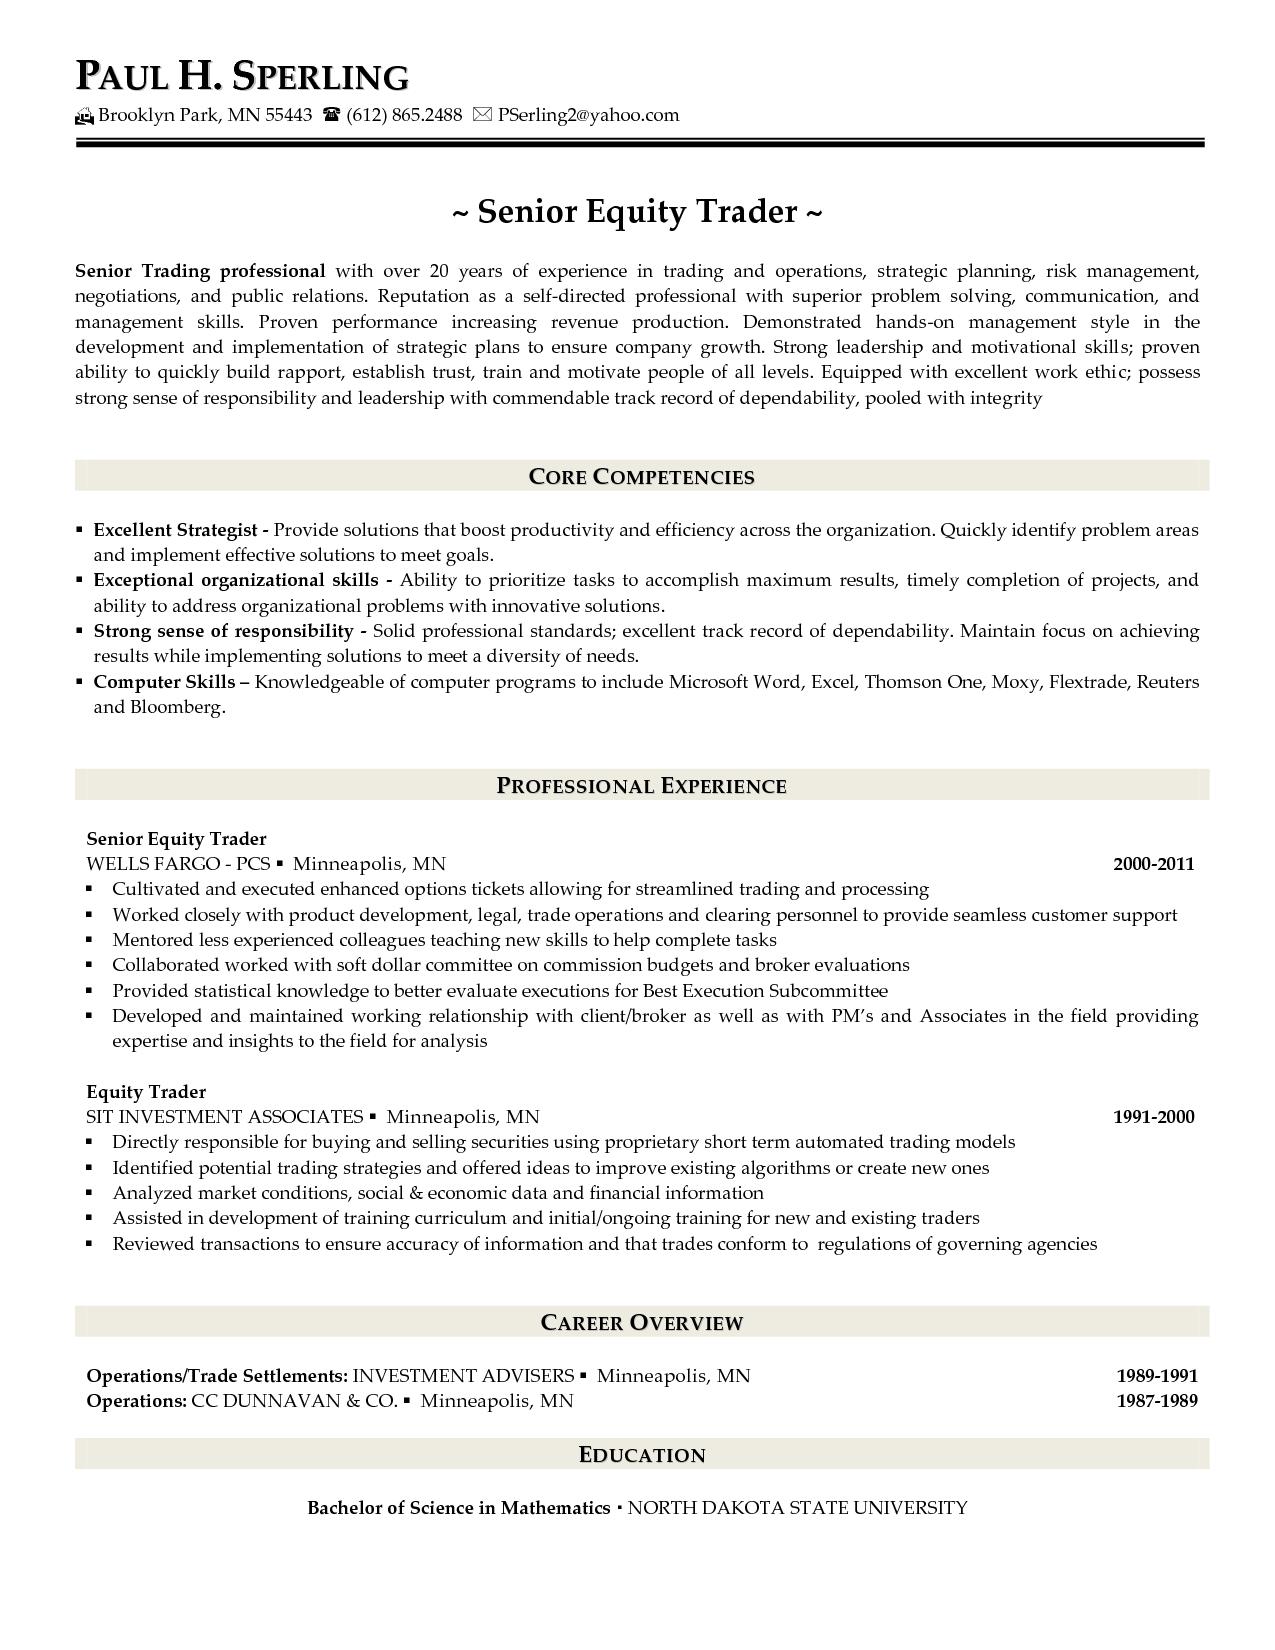 Proprietary Trading Resume Samplecareer Resume Template Career Resume Template Proprietary Trading Management Skills Resume